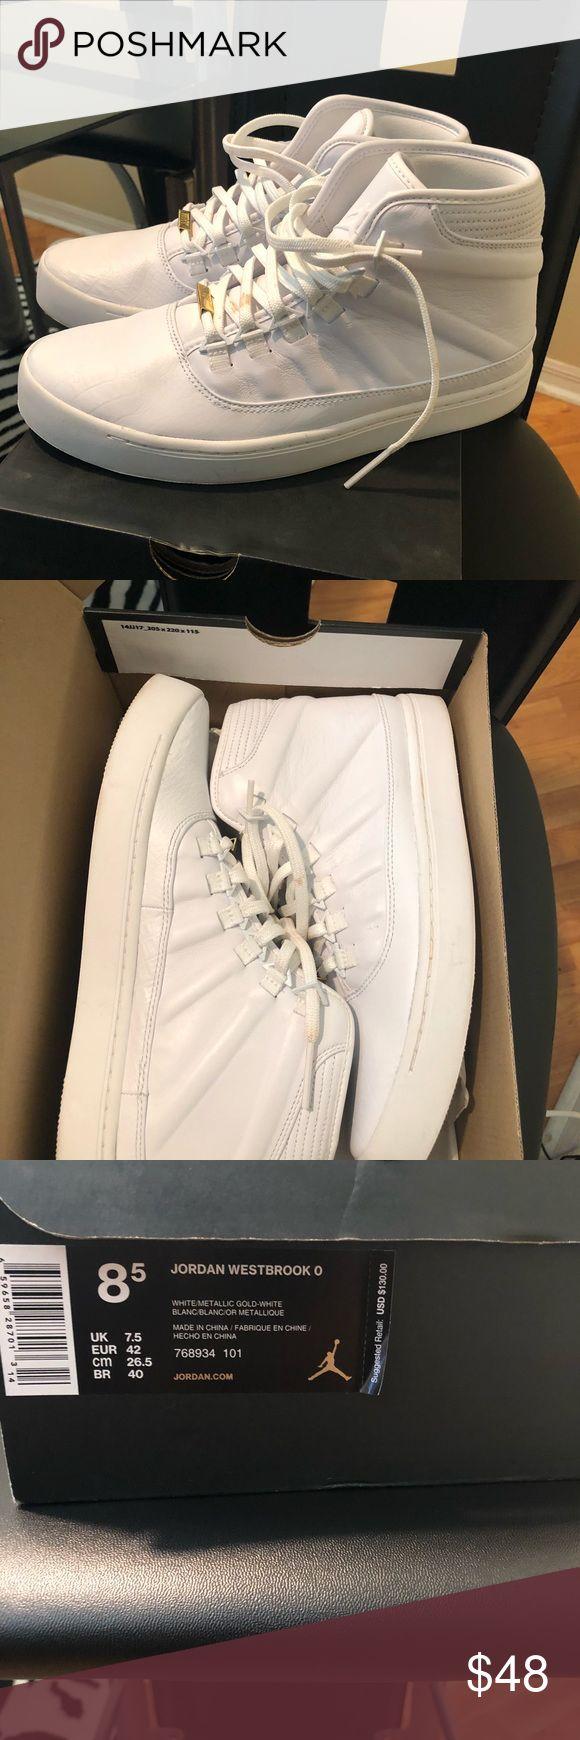 {Jordan} Westbrook Sneakers Worn once. Box is included. Open to reasonable offers. Jordan Shoes Athletic Shoes